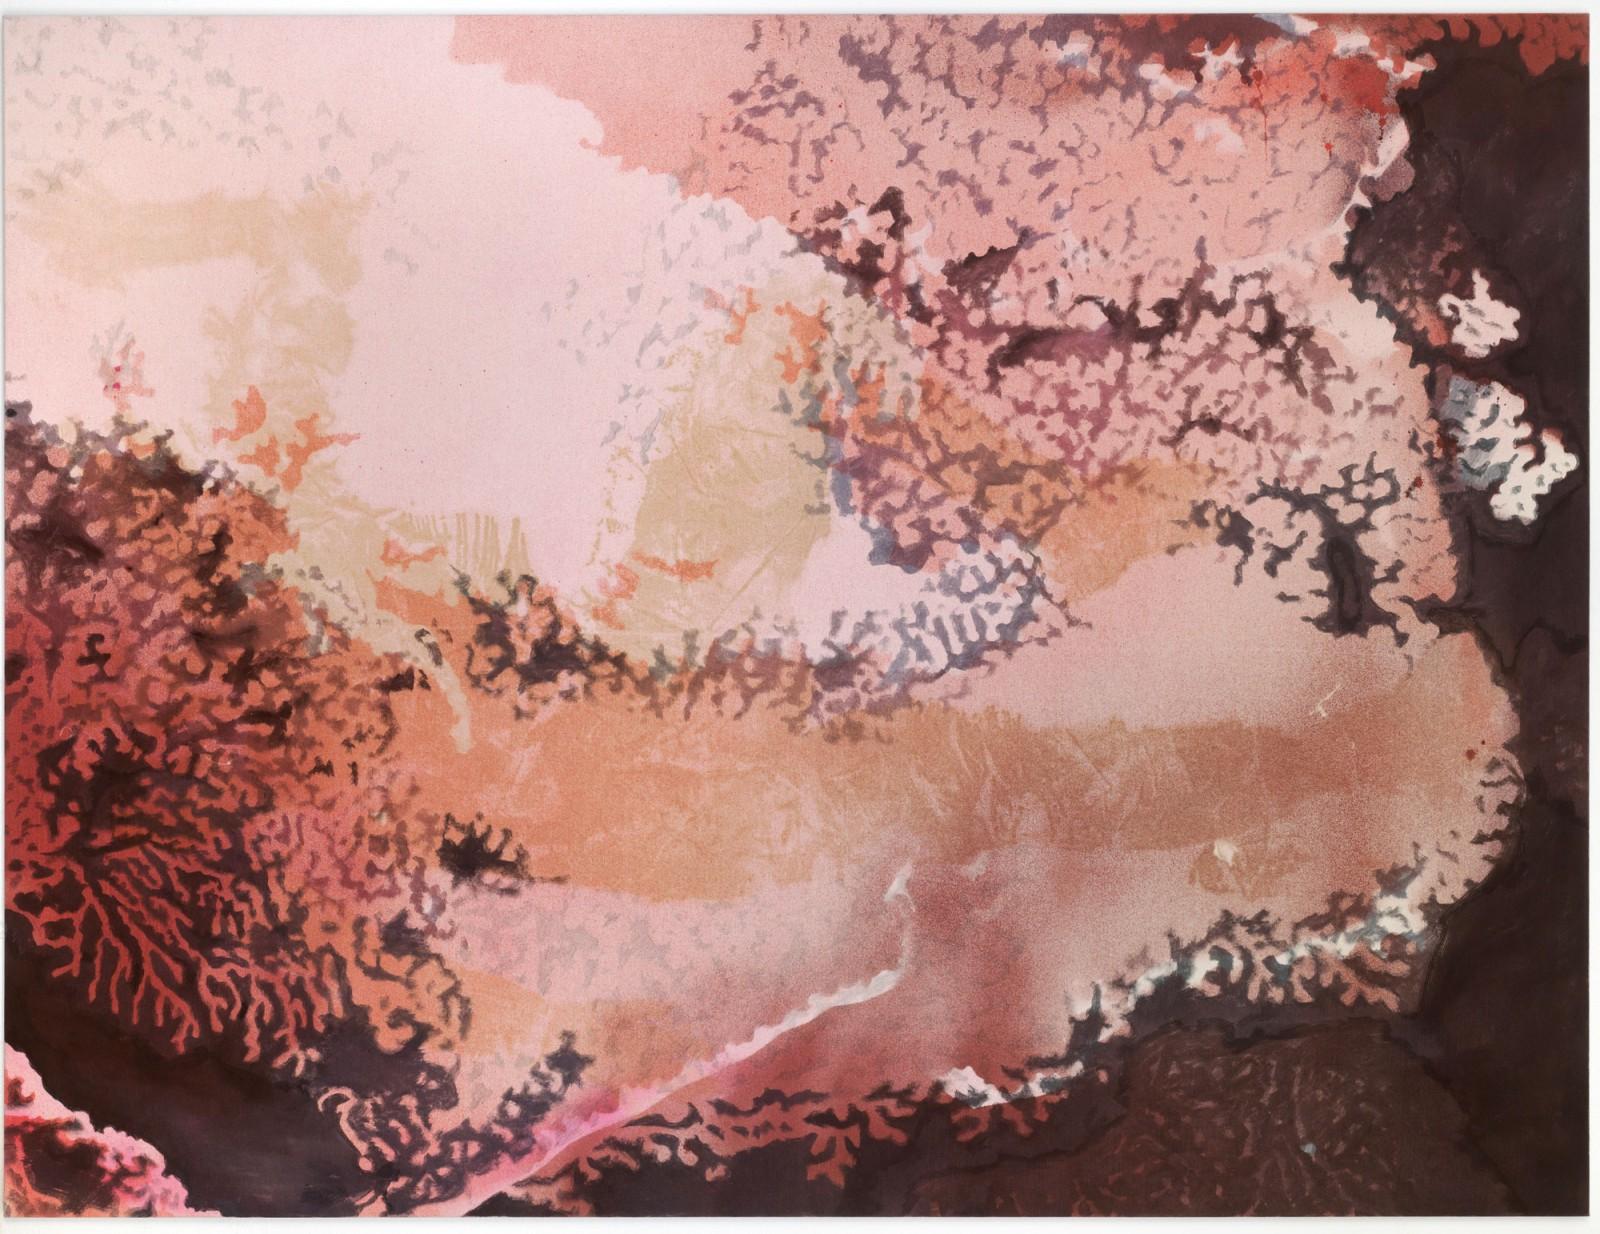 Kim Nekarda: pequod, 2011, vinyl color, poppy oil & body print on cotton, 150 x 200 cm